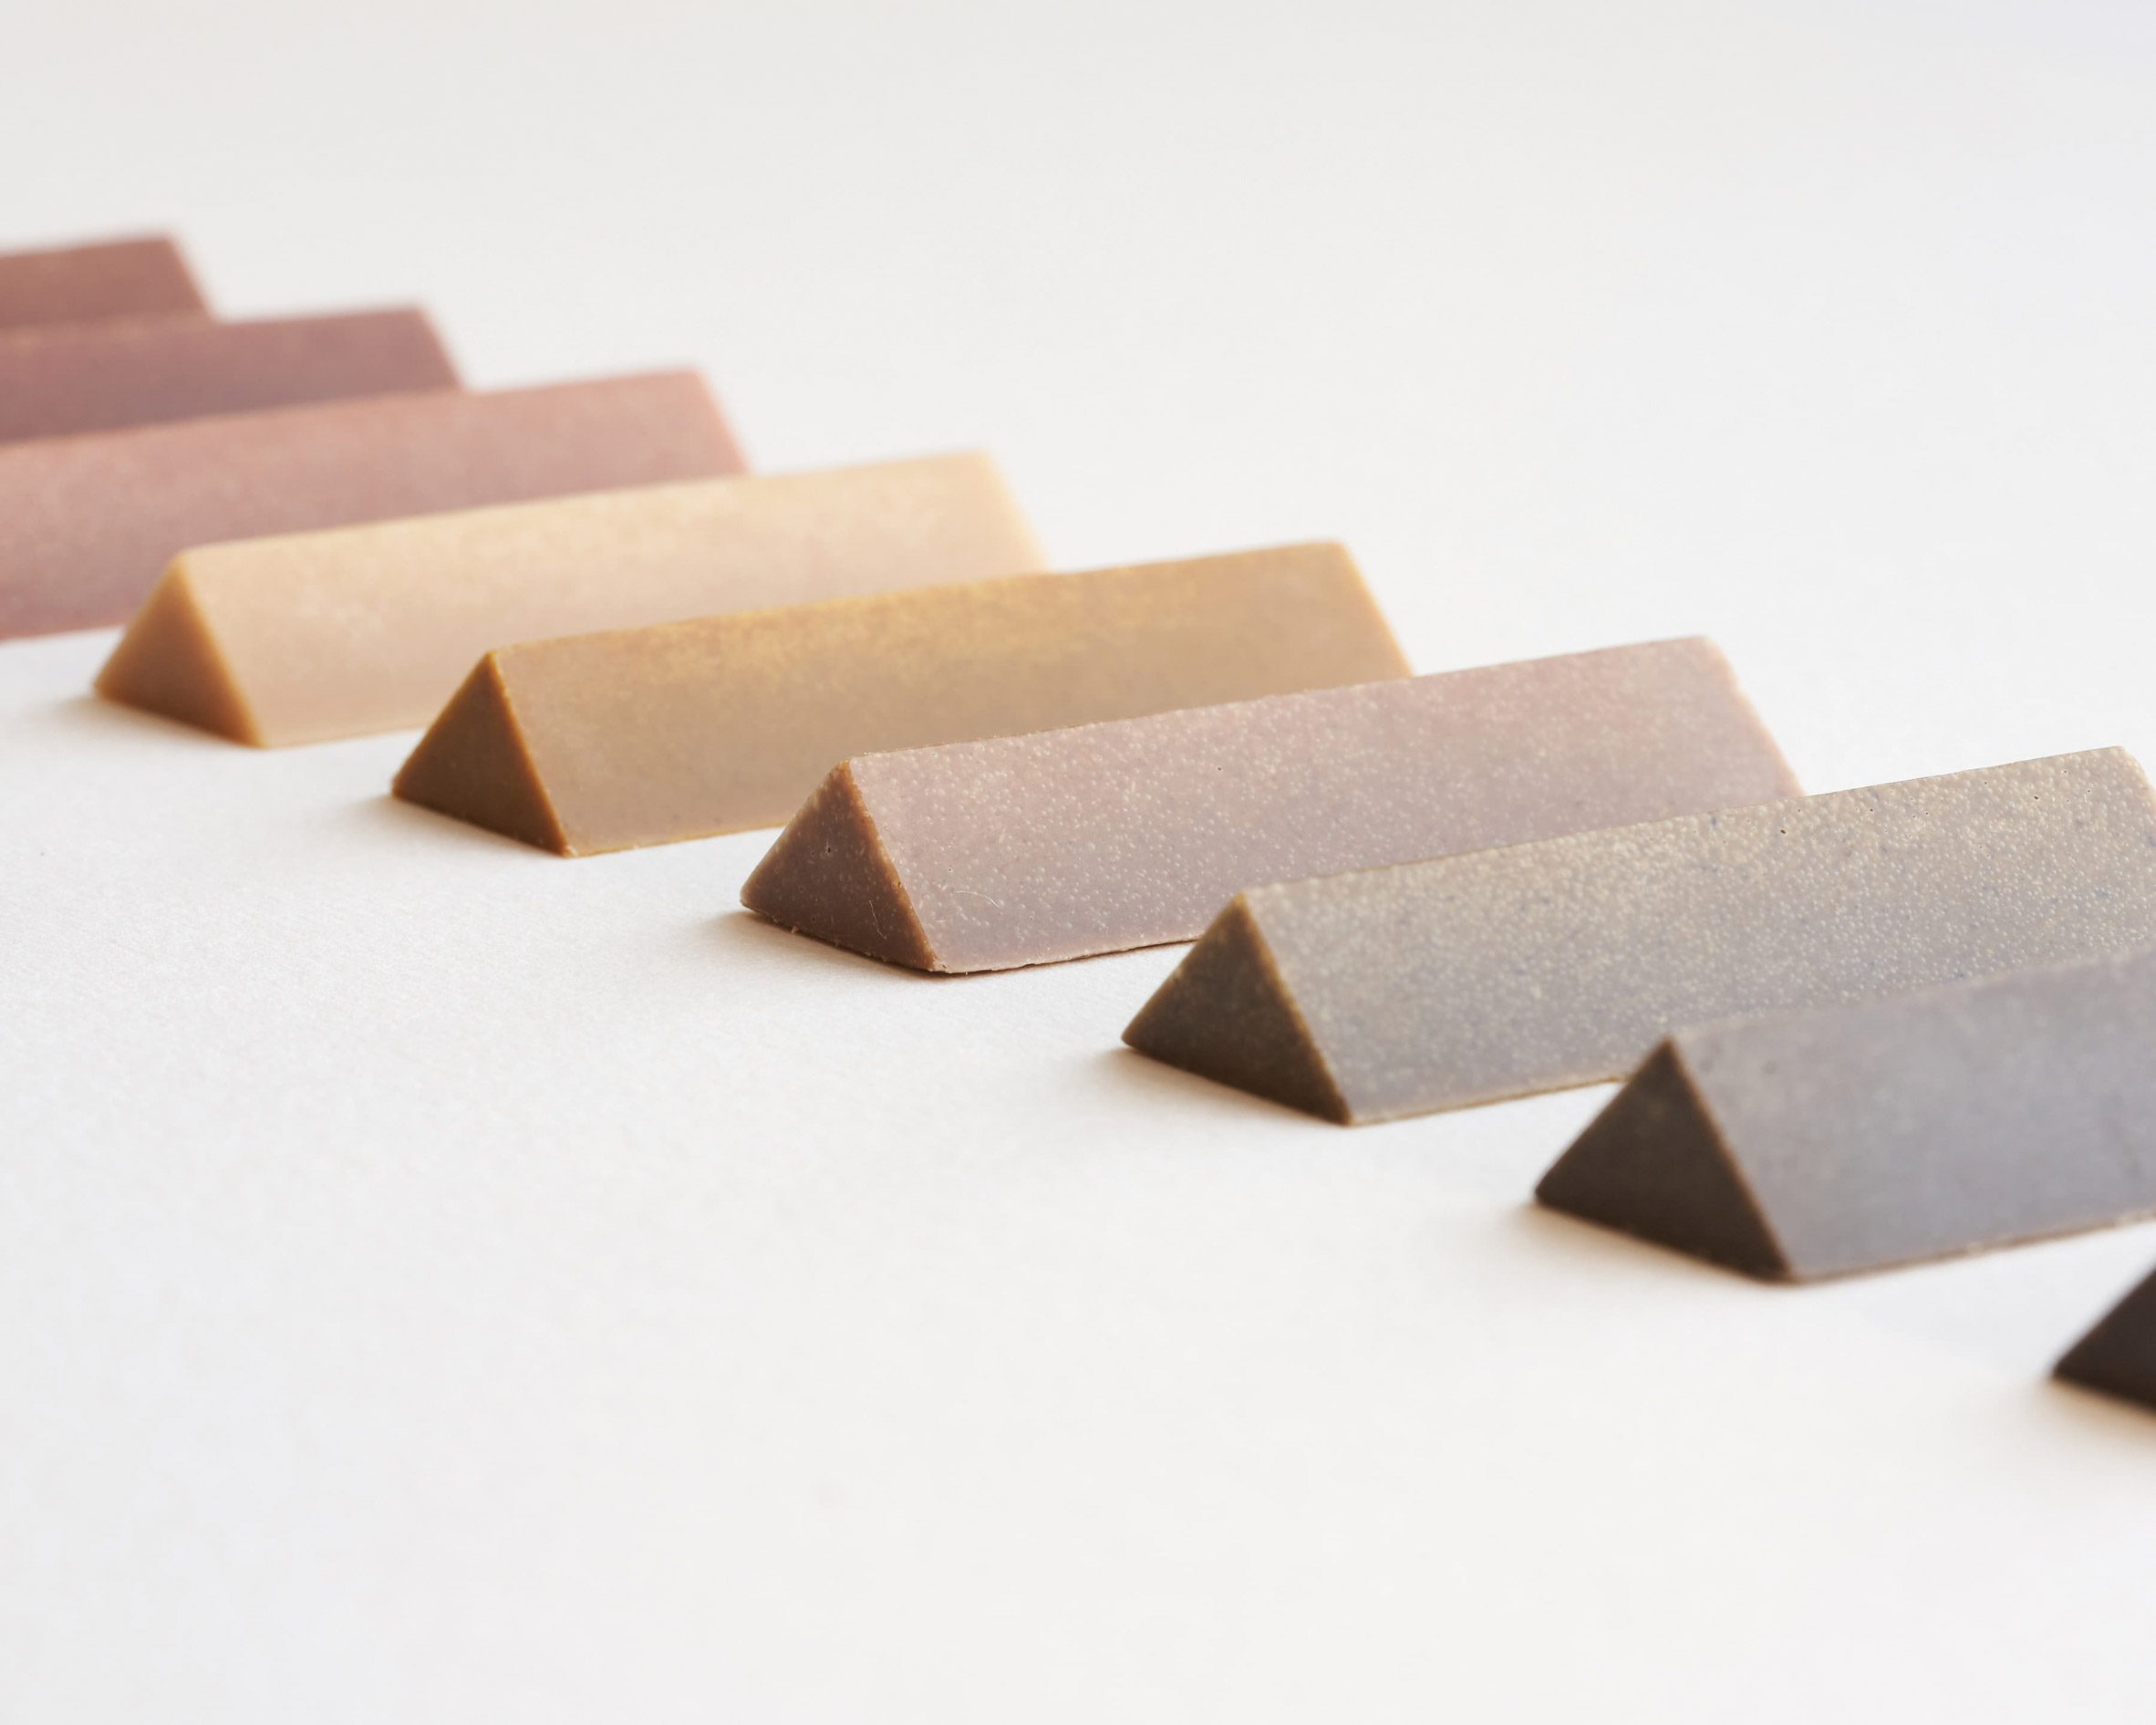 Triangular-shaped crayons